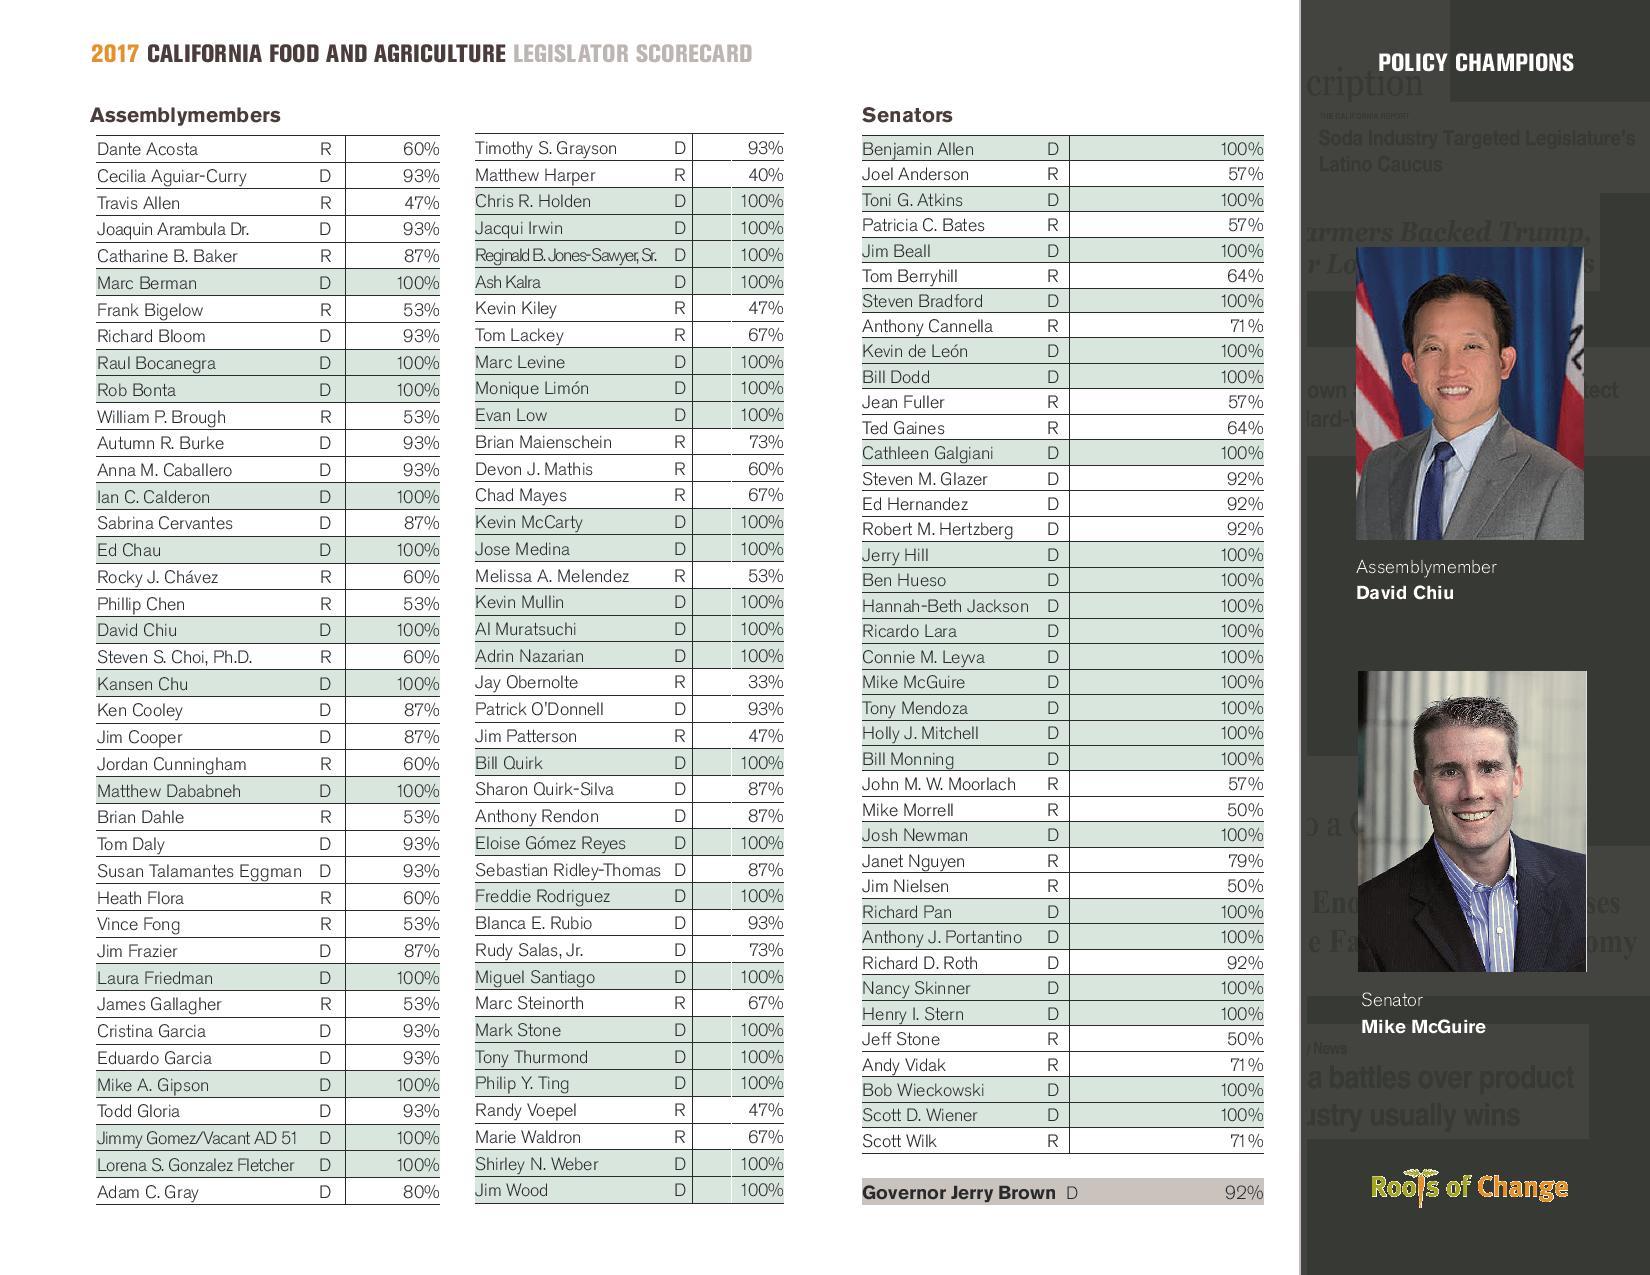 Roots of Change - 100% - 2017 Legislative Scorecard